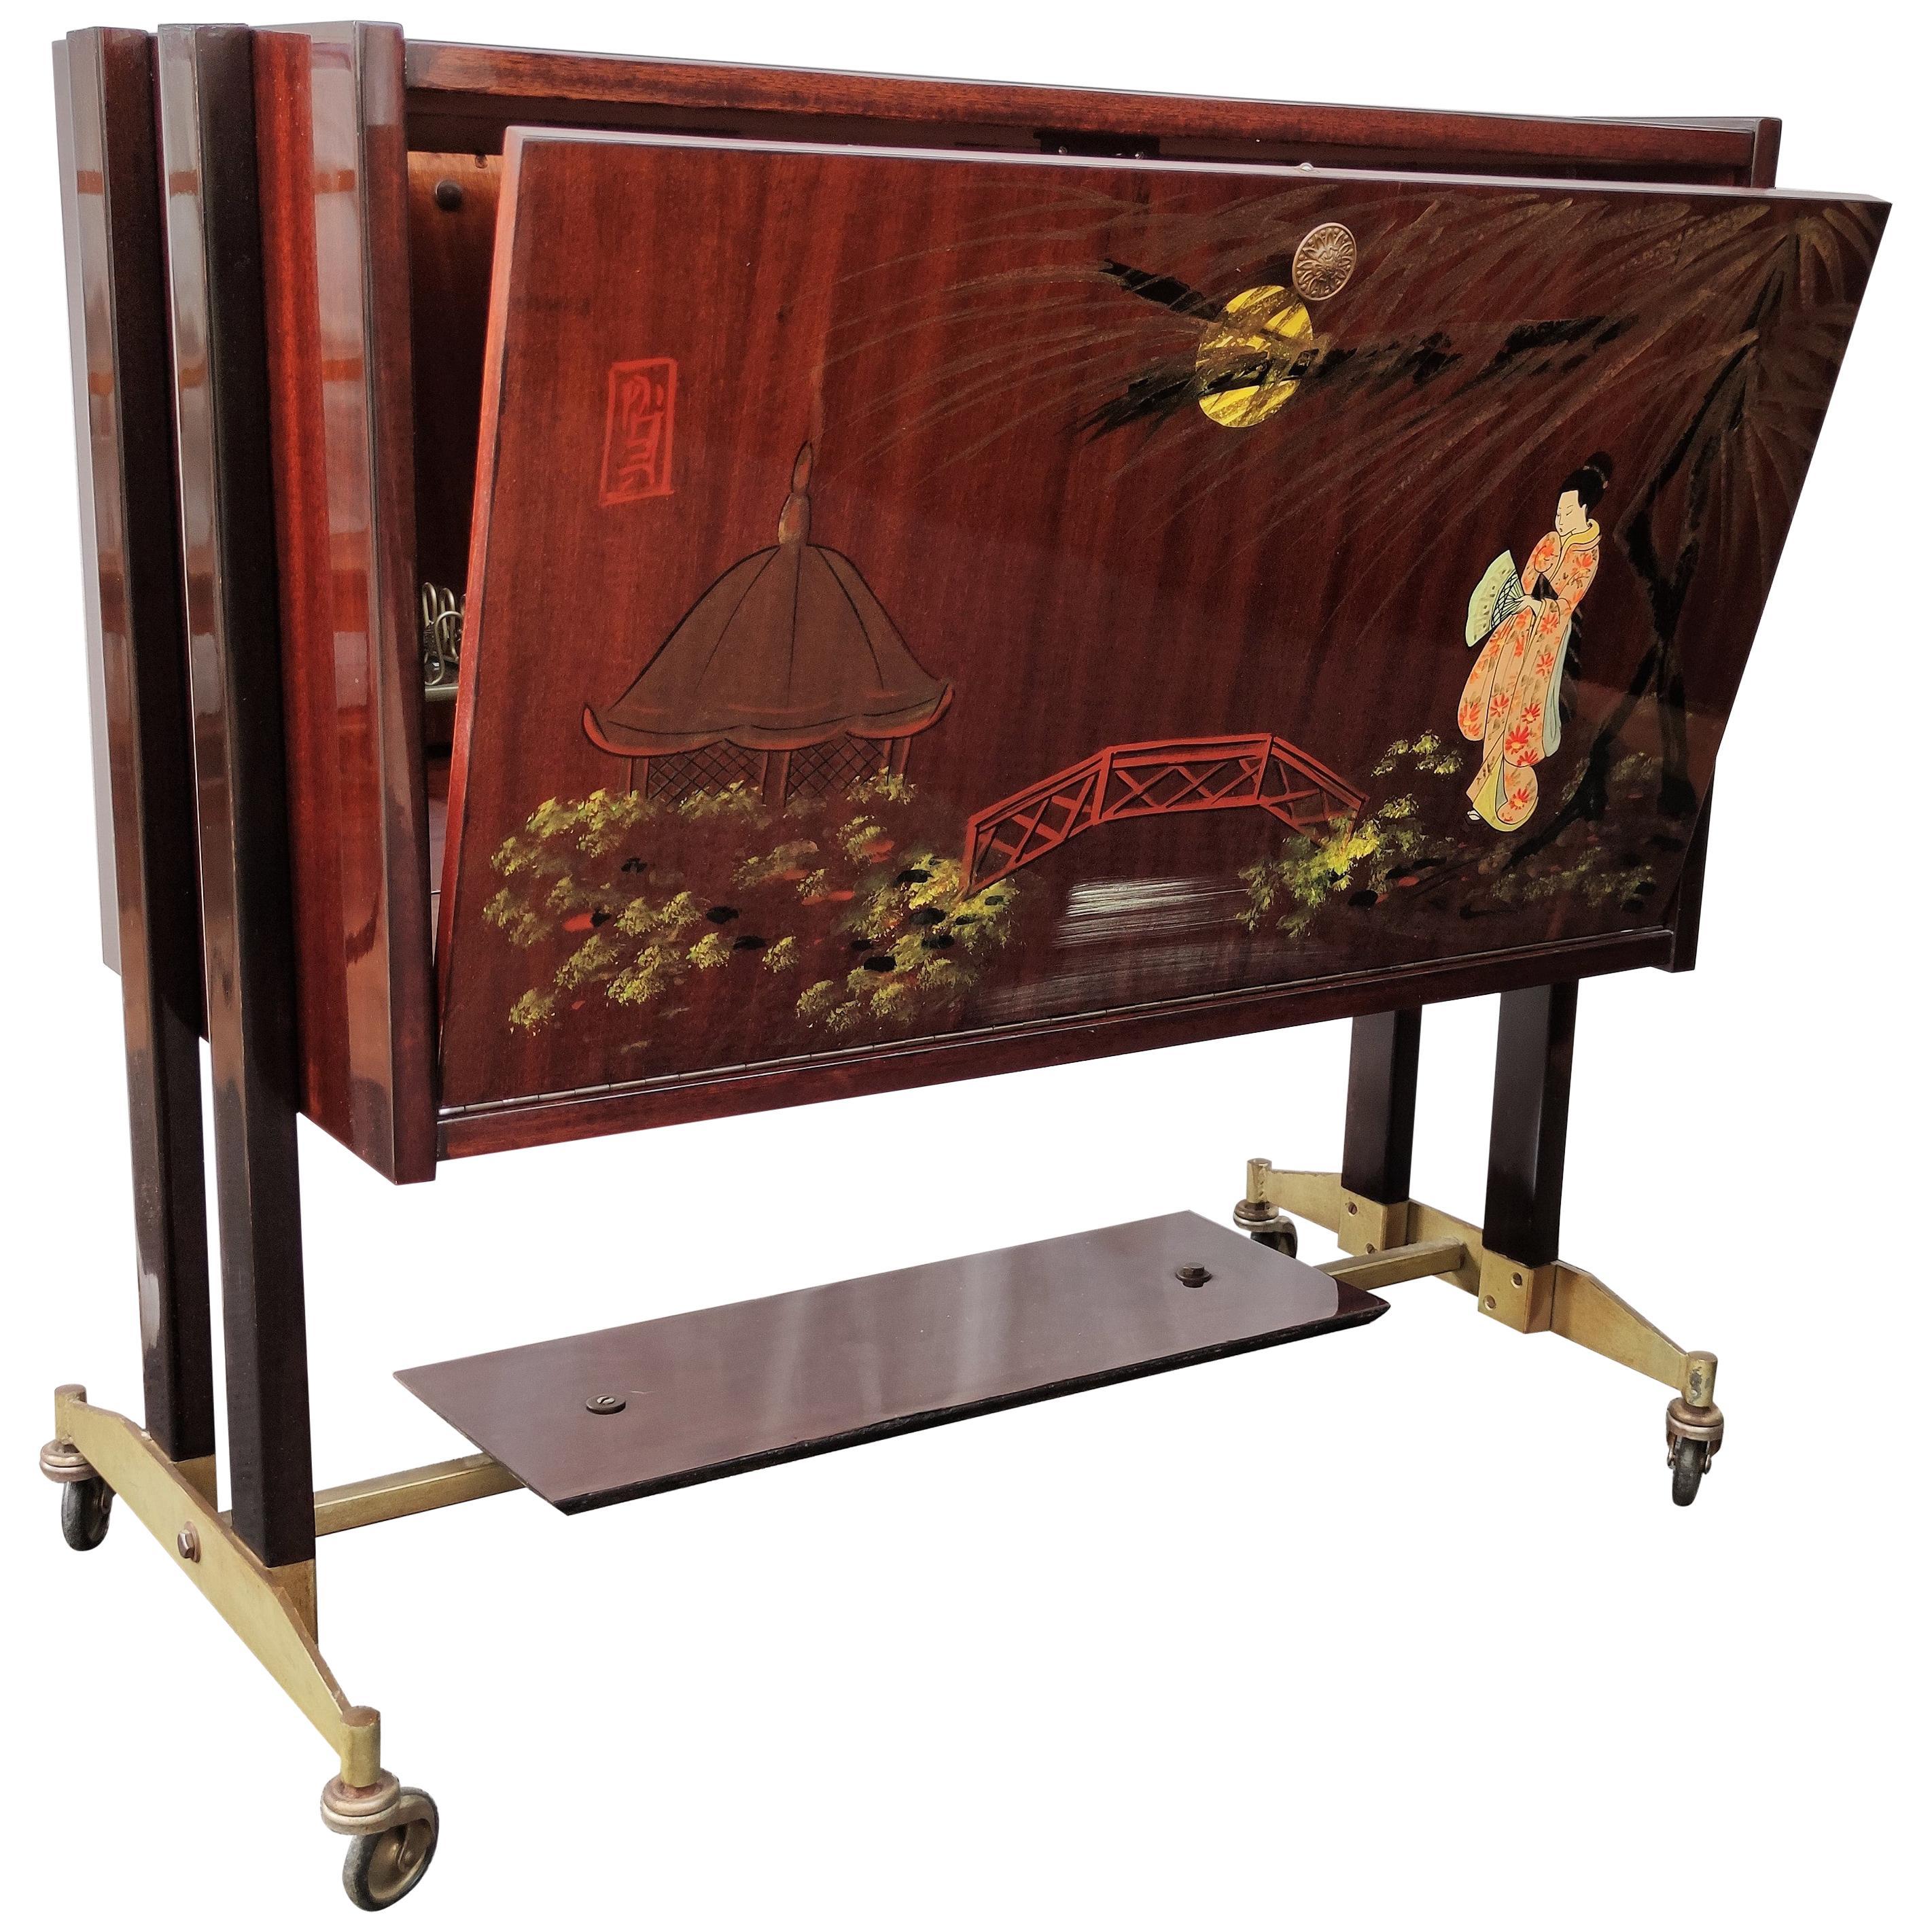 1950s Midcentury Regency Italian Wood, Brass and Mirror Dry Bar Cabinet Cart